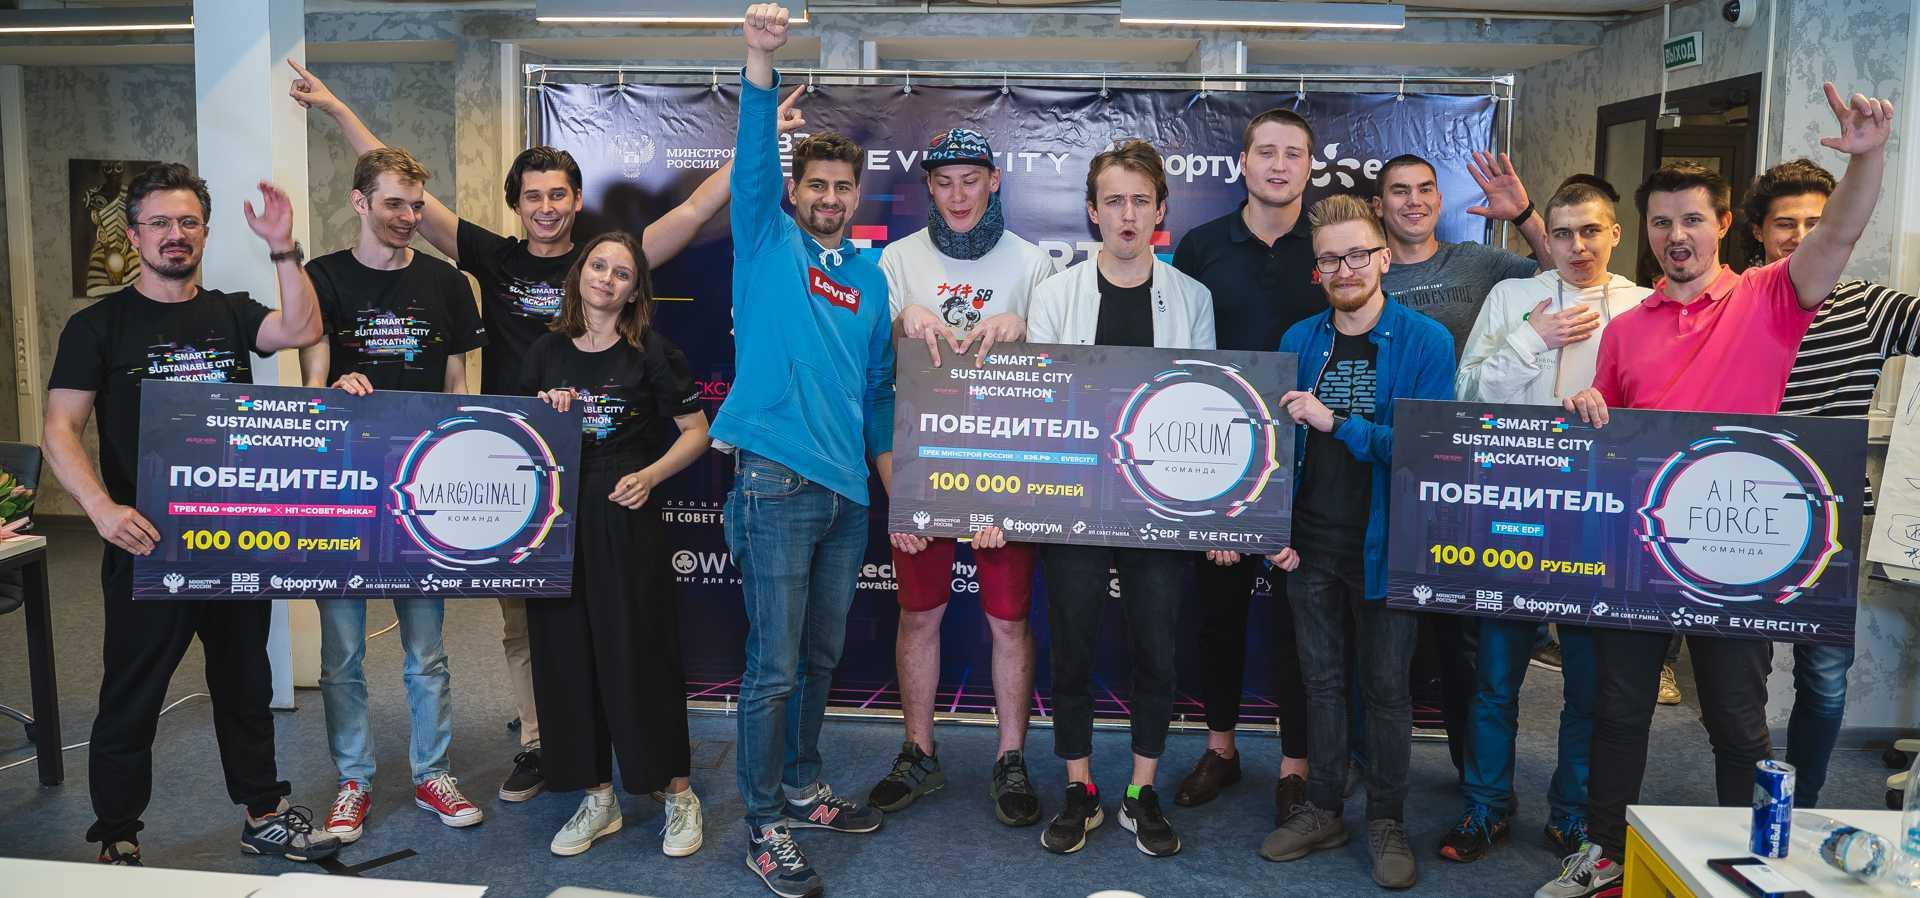 Substrate, Web 3.0 и умные города: в Москве прошел хакатон Smart Sustainable City Hack при поддержке Parity Technologies